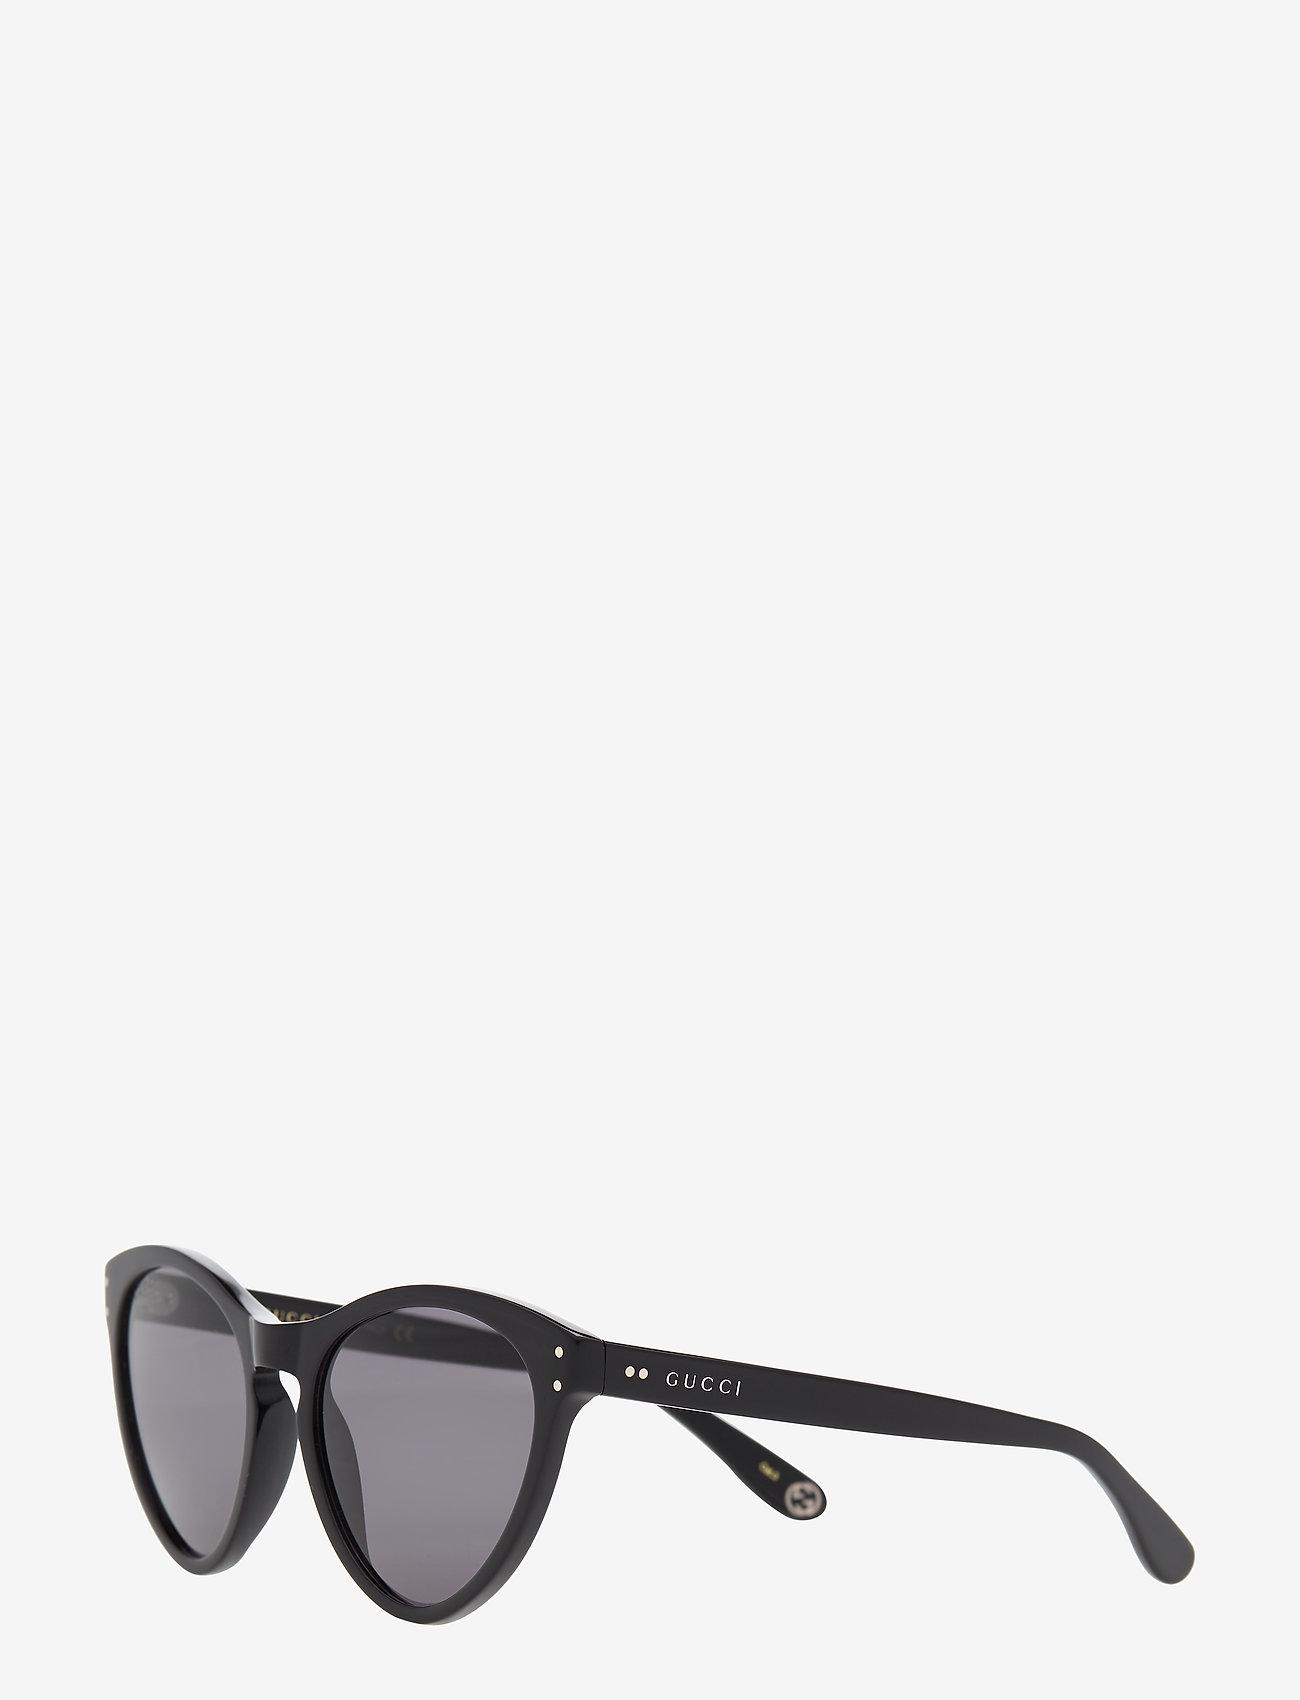 Gucci Sunglasses - GG0569S - cat-eye - black-black-grey - 1